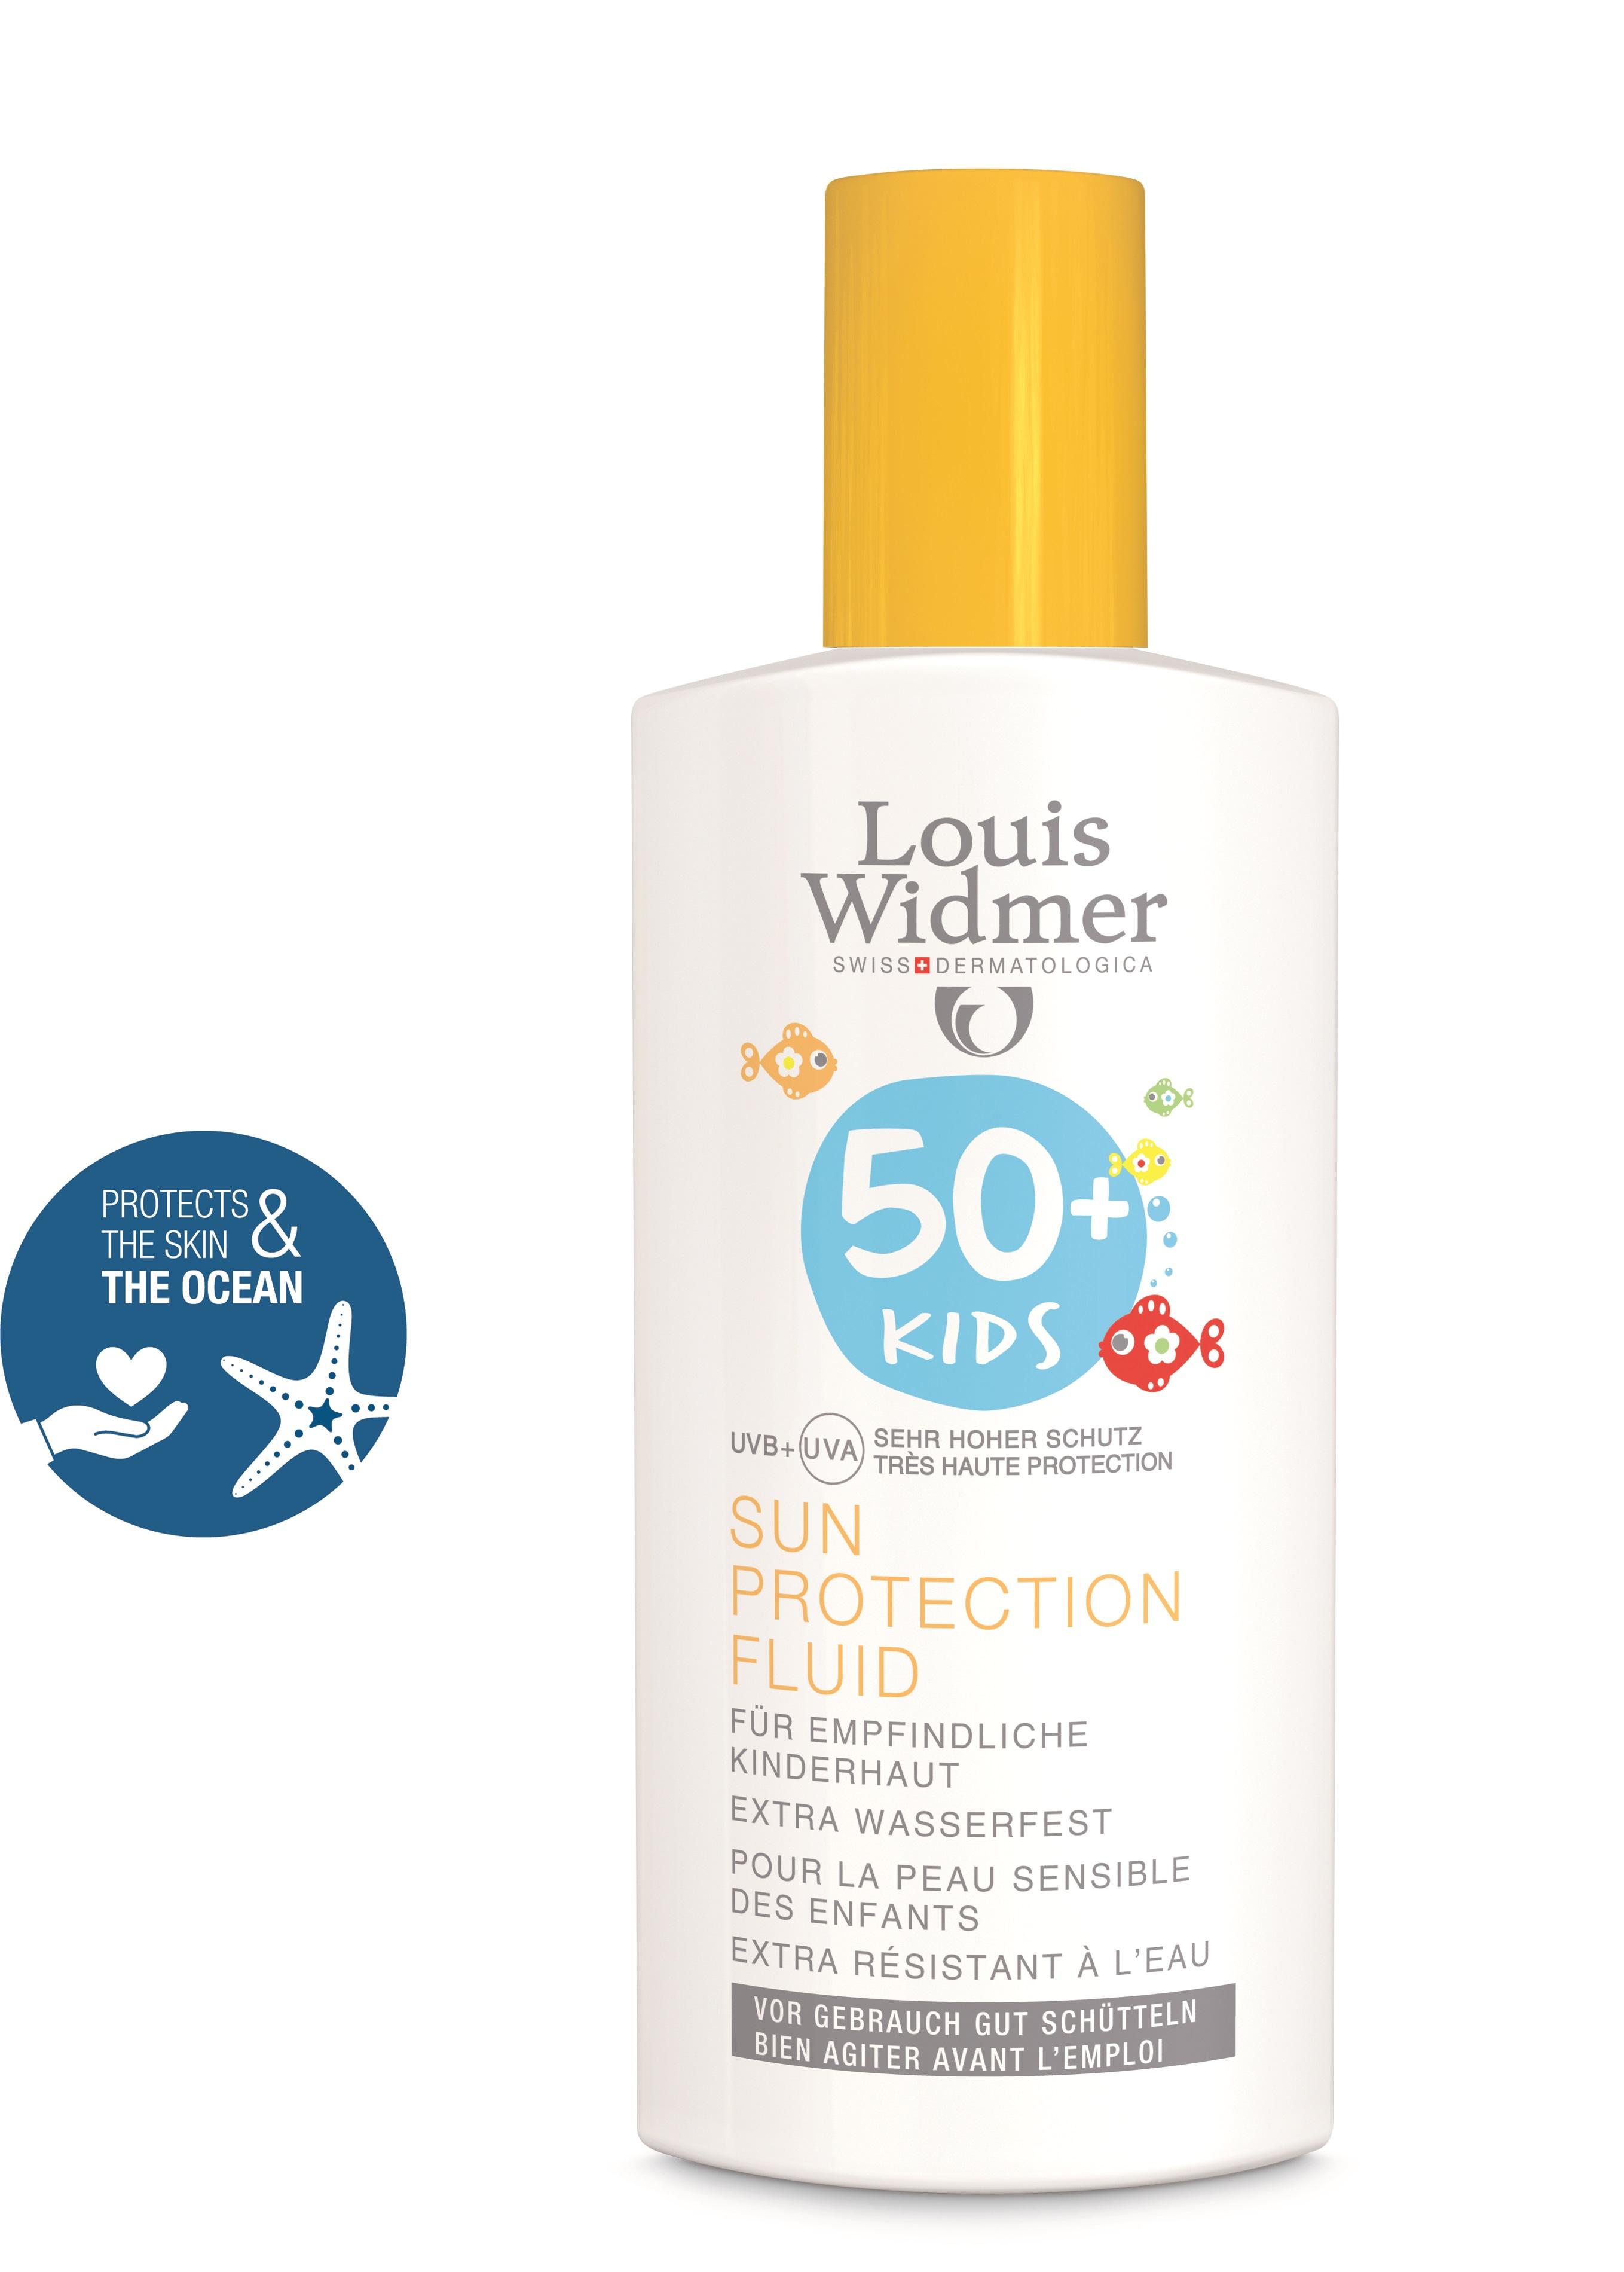 Widmer Sun Protection Kids Fluid 50+